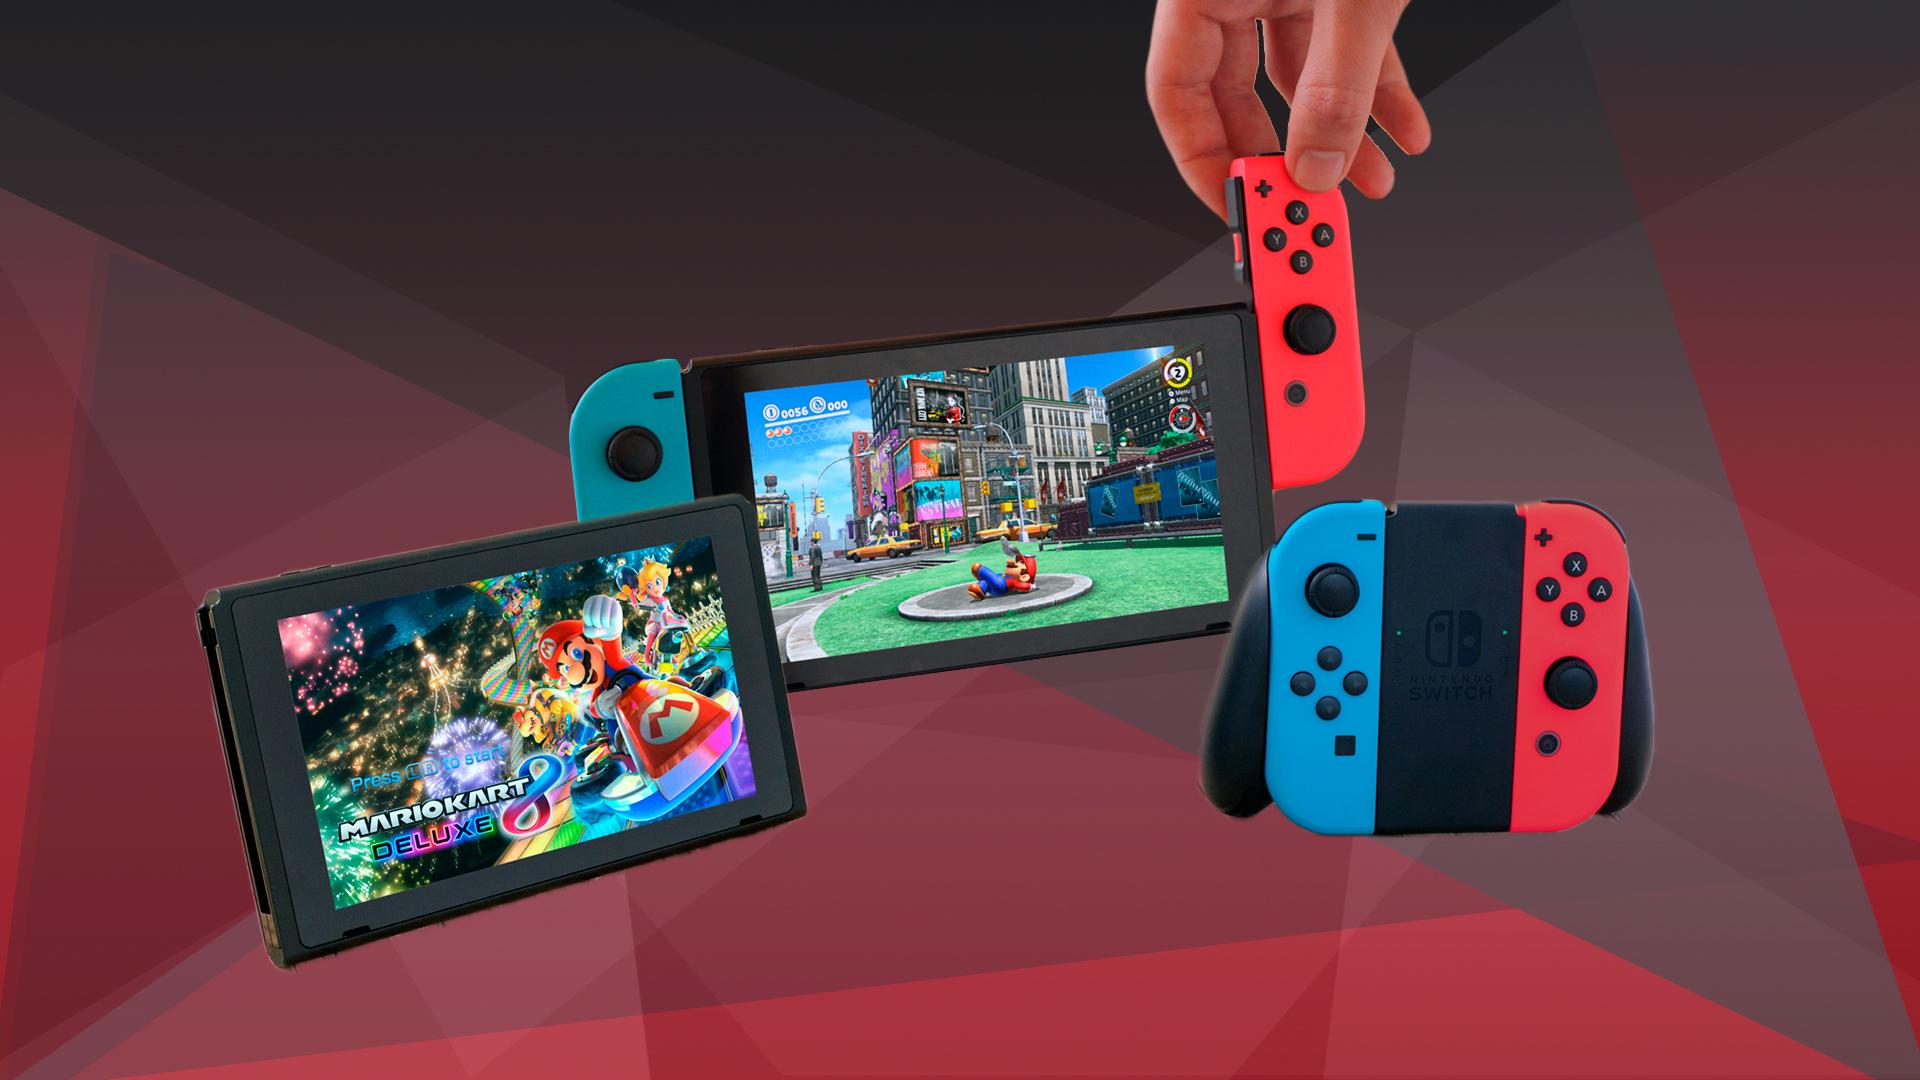 Nintendo Switch, Nintendo Konsole, Code, Timm Mohn, Ausland, eShop, Nintendo eShop, Spiele-Code